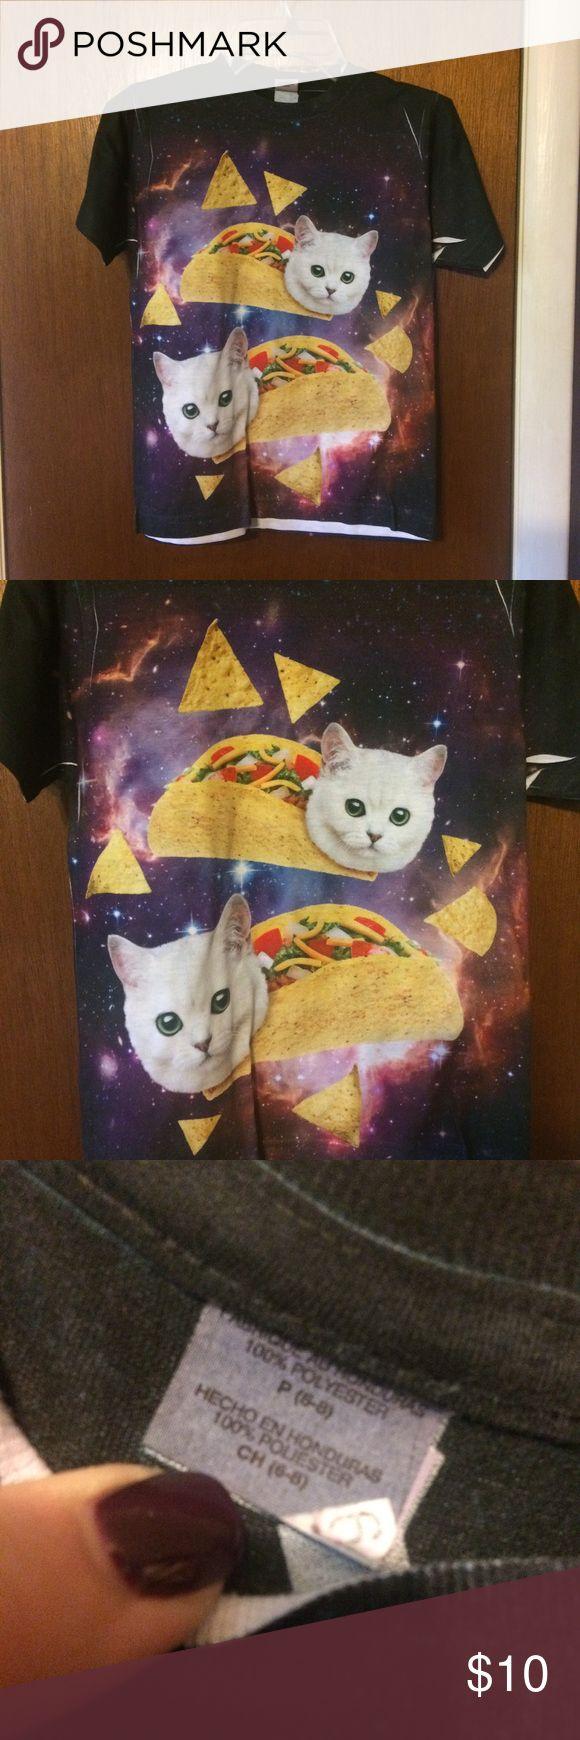 Taco cat tee Taco cat t shirt. Shirts & Tops Tees - Short Sleeve